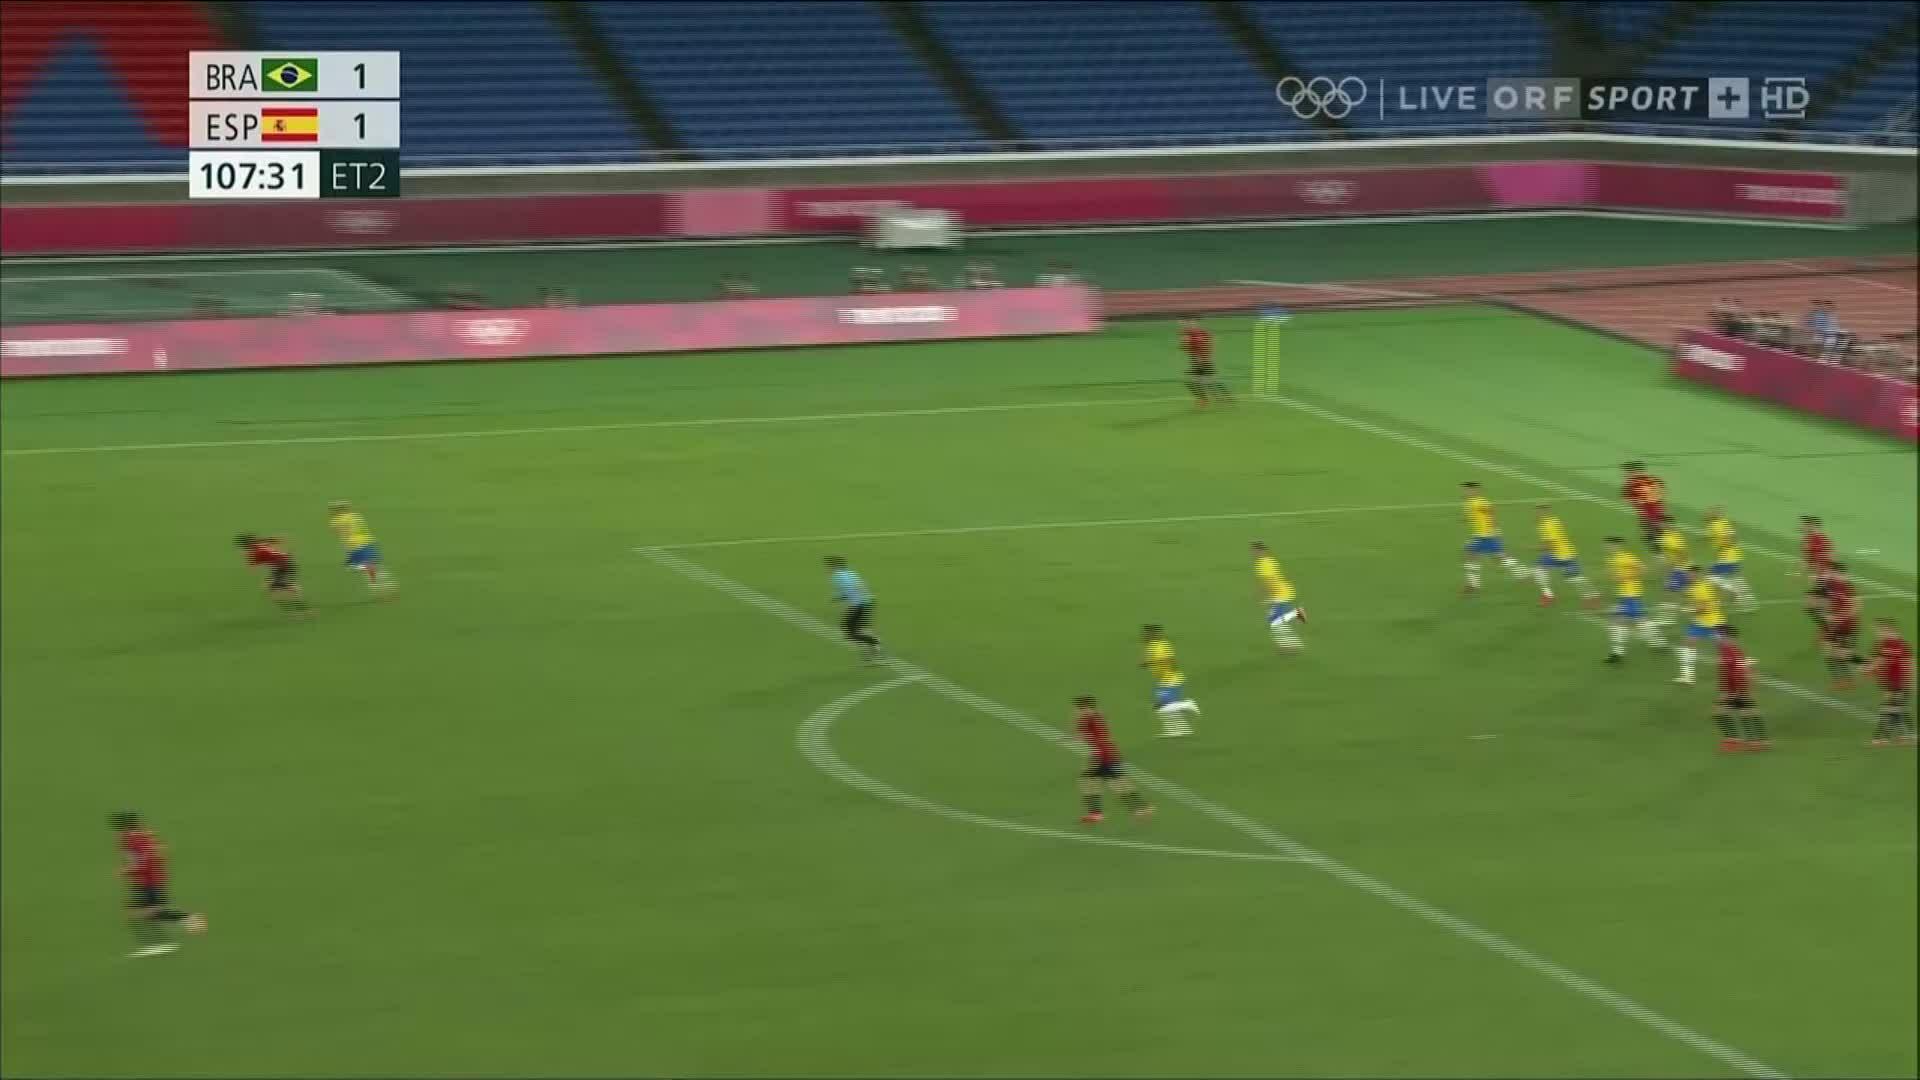 2-1 cho Brazil